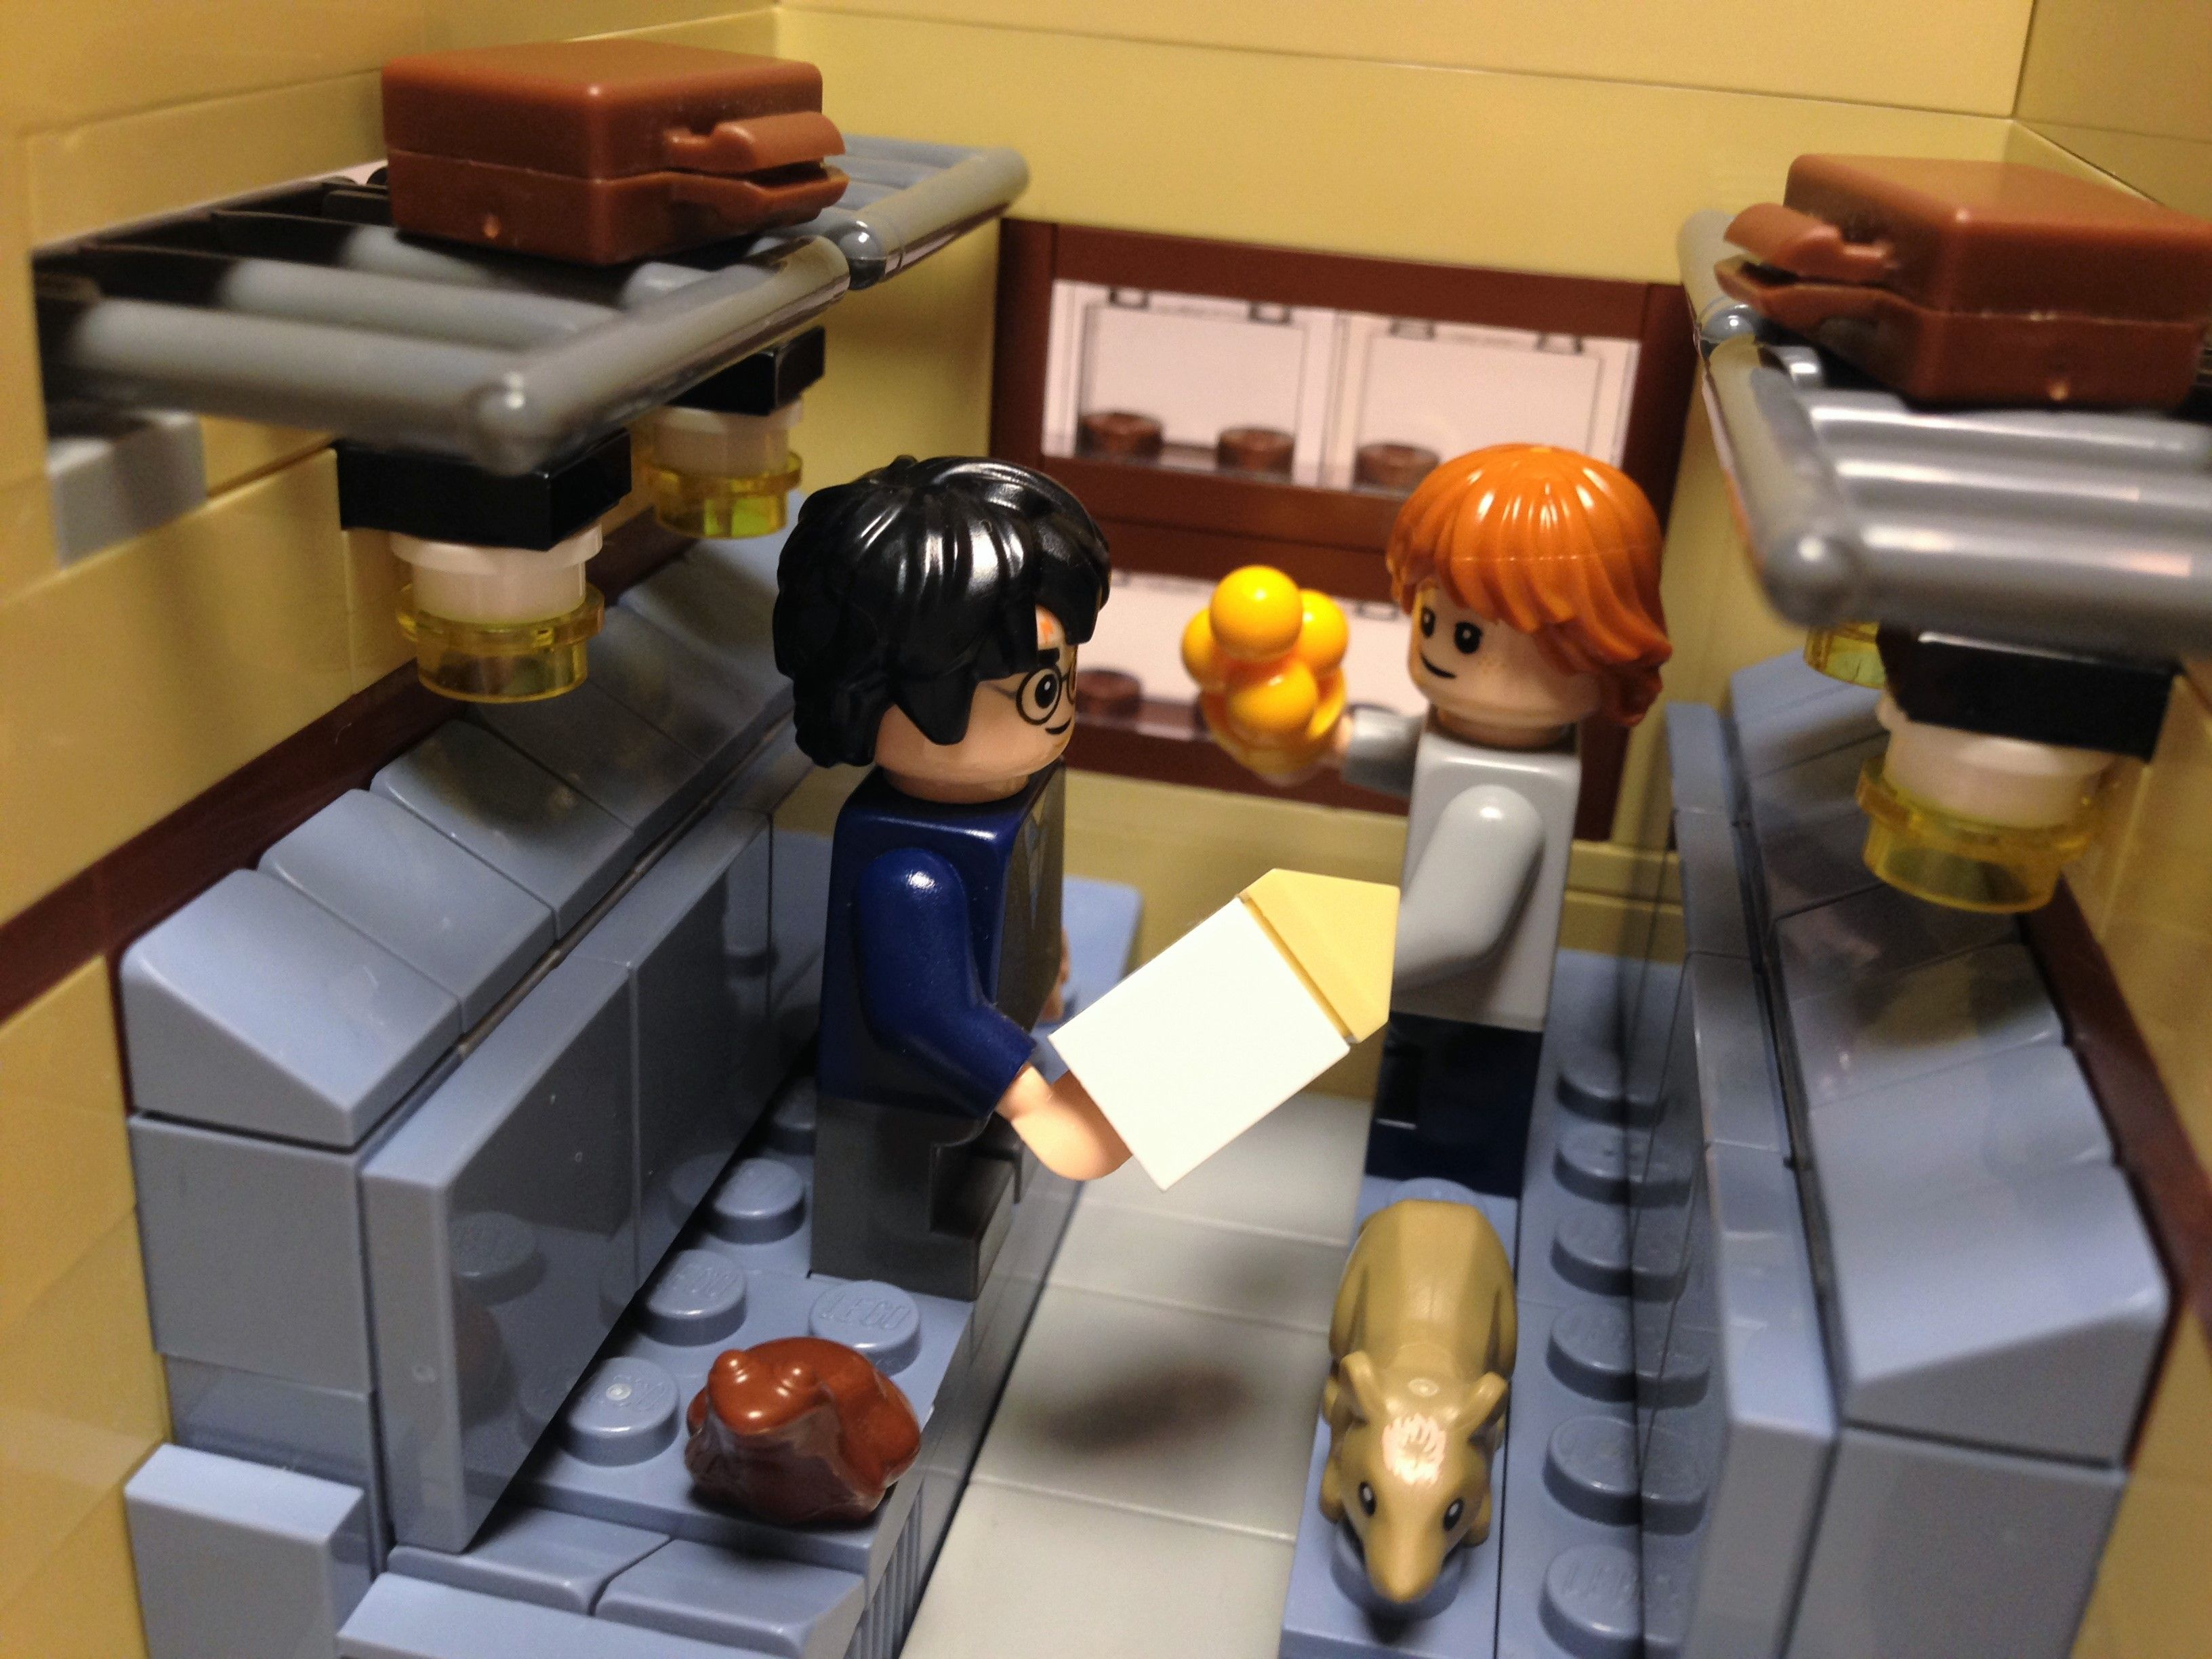 Hogwarts Express Cabin Scene Lego Harry Potter Moc Lego Harry Potter Lego Hogwarts